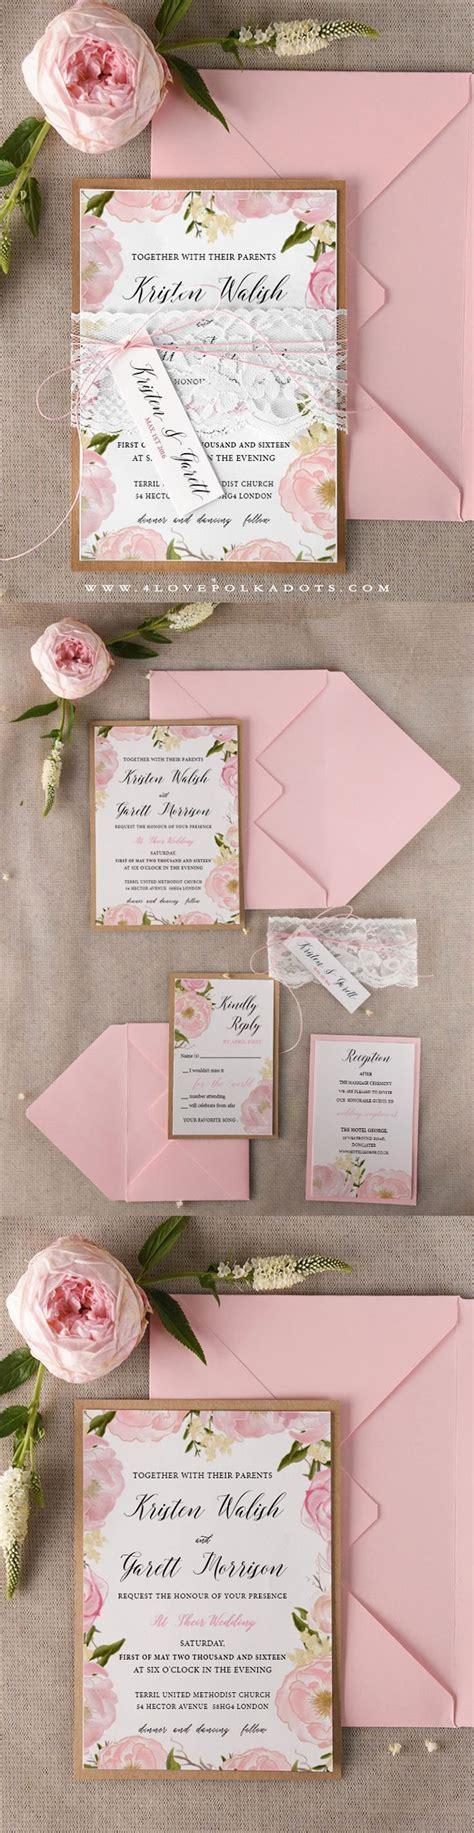 Wedding Invitation Ideas by Best 25 Floral Wedding Invitations Ideas On